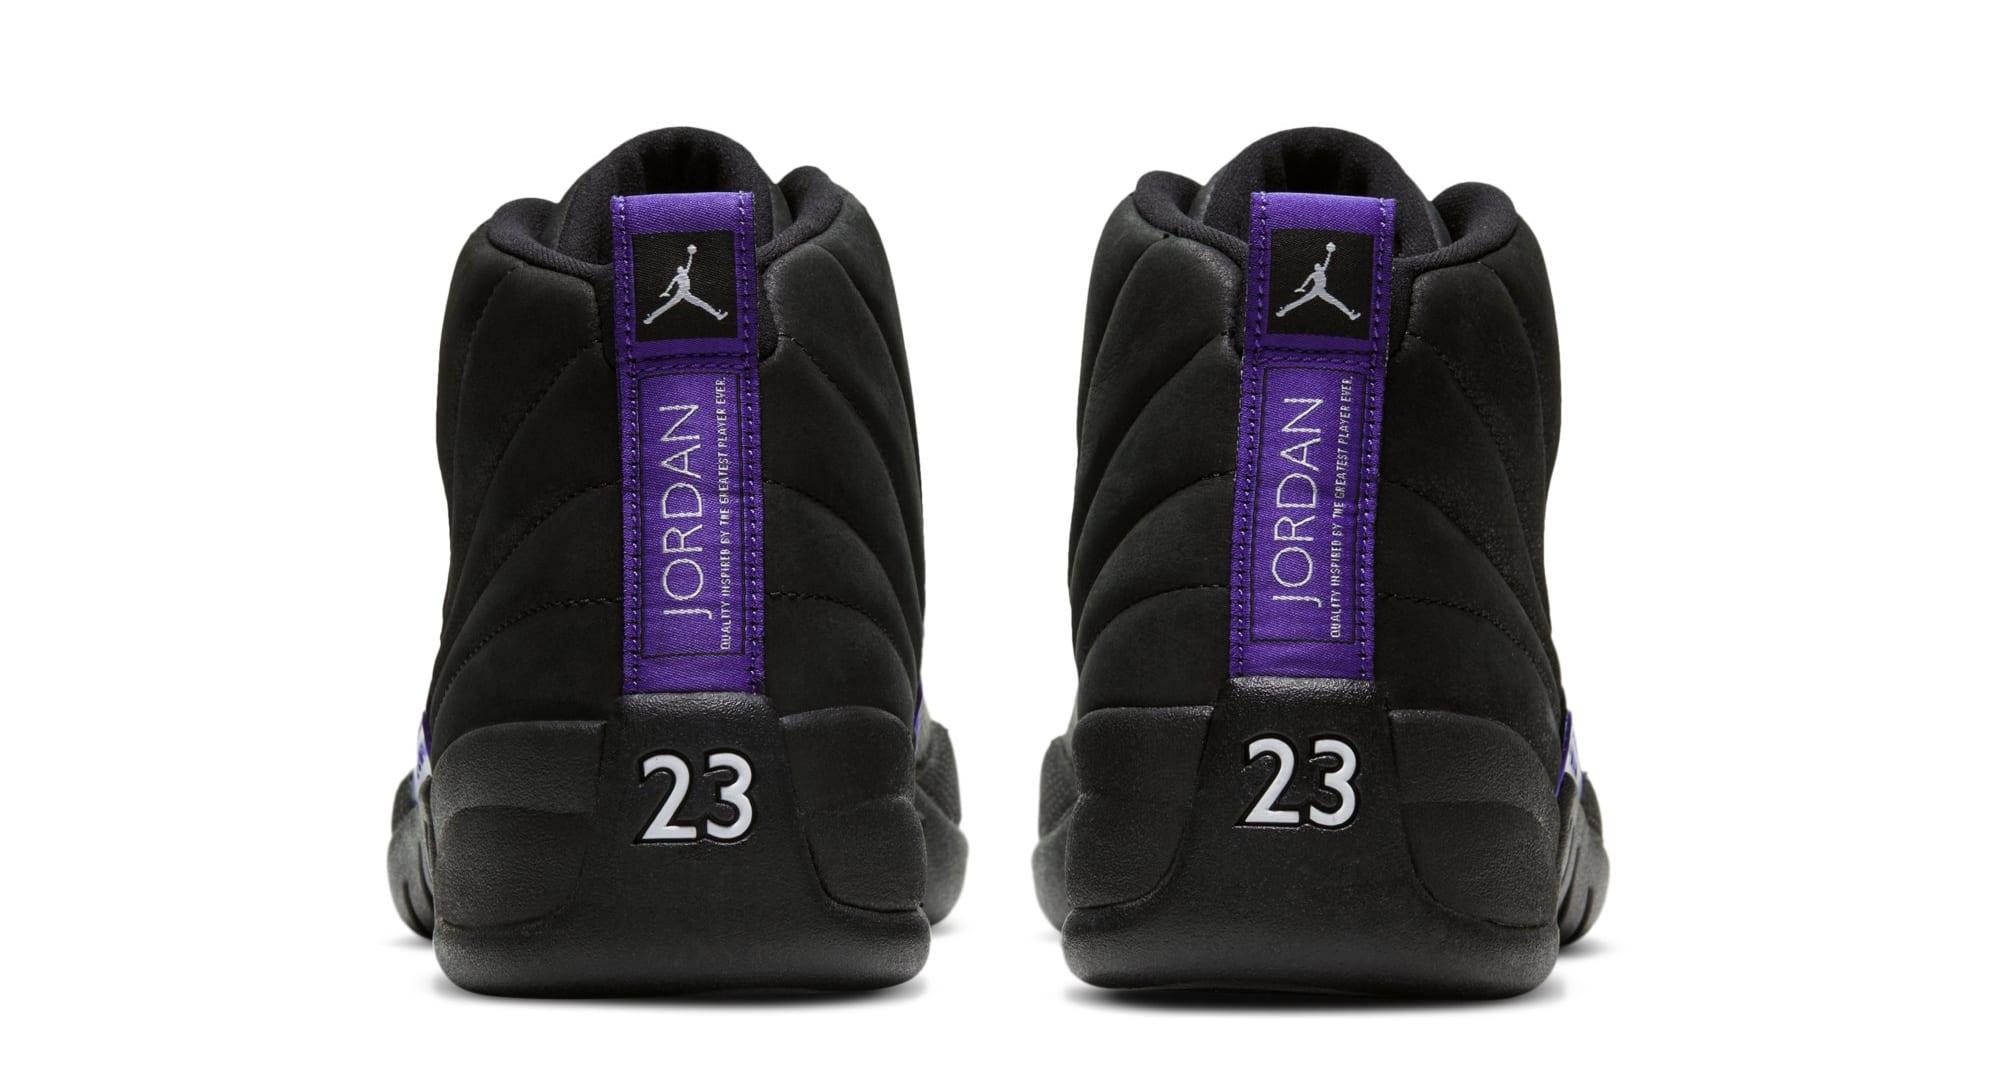 Air Jordan 12 Retro 'Black/Black/Dark Concord' CT8013-005 (Heel)